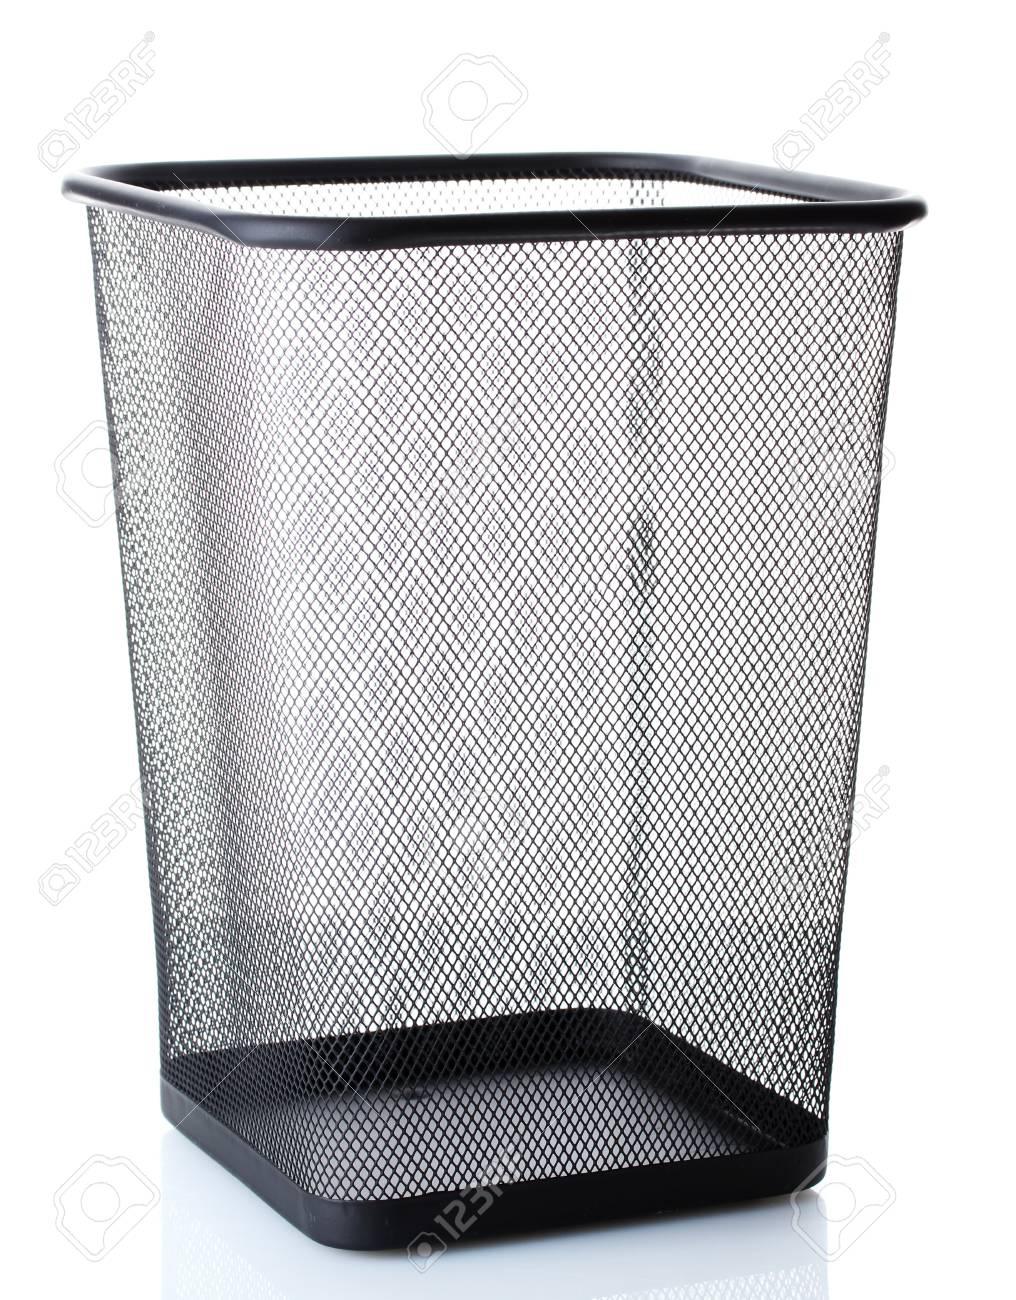 empty metal trash bin  isolated on white Stock Photo - 12822683